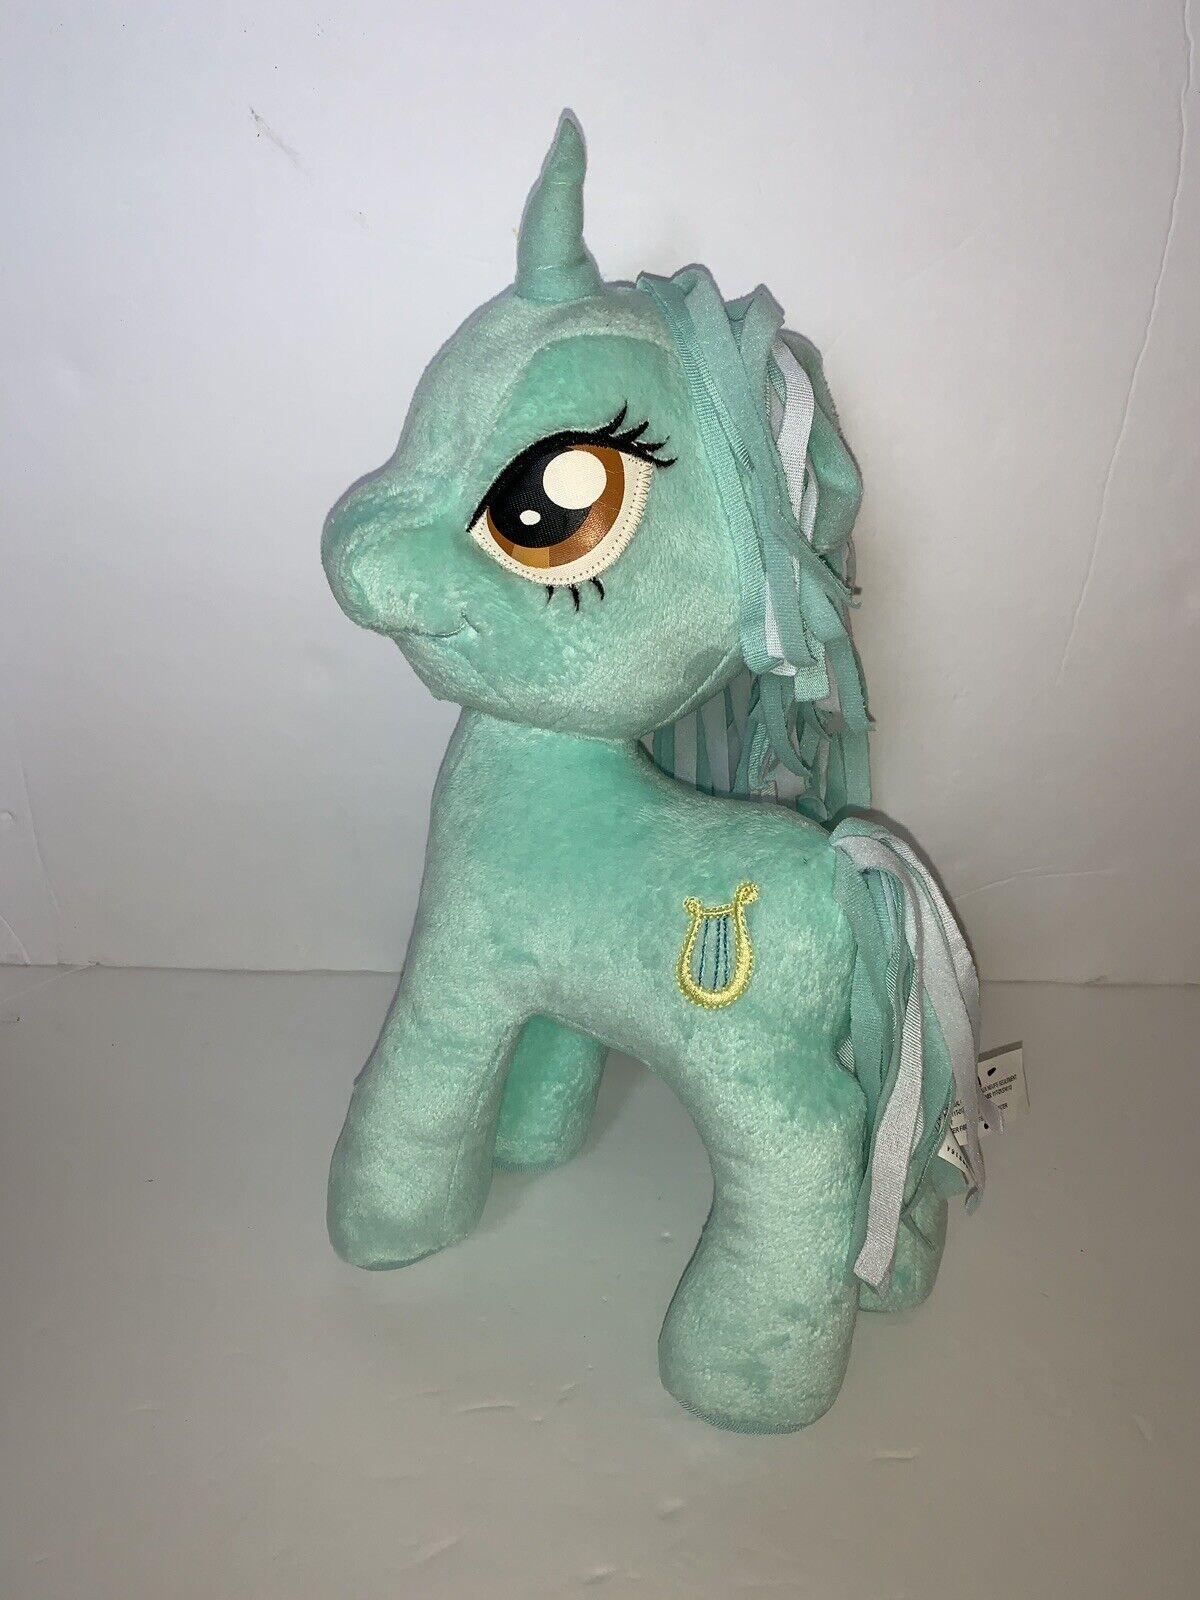 My Little Pony Fan Labor Wiki Harp Stuffed Animal Plush Doll Hasbro 2015